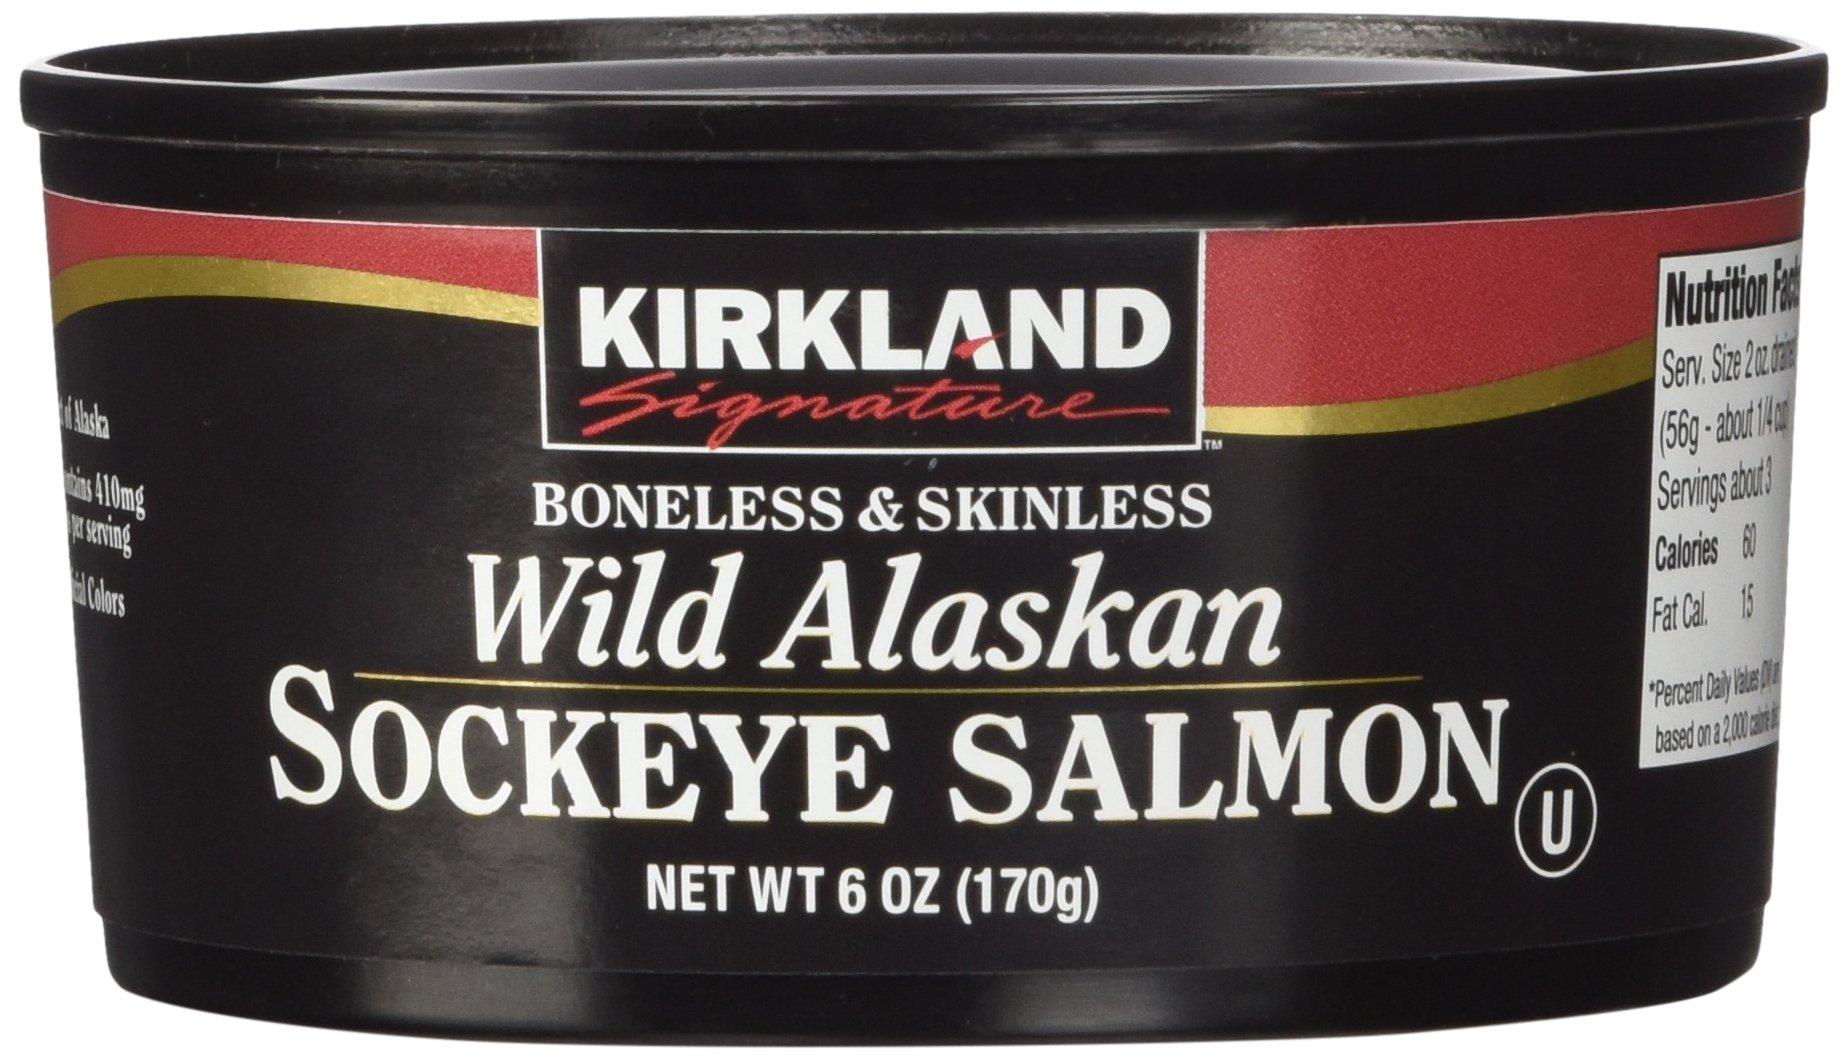 Kirkland Signature Wild Alaskan Sockeye Salmon, 6oz, Pack of 3